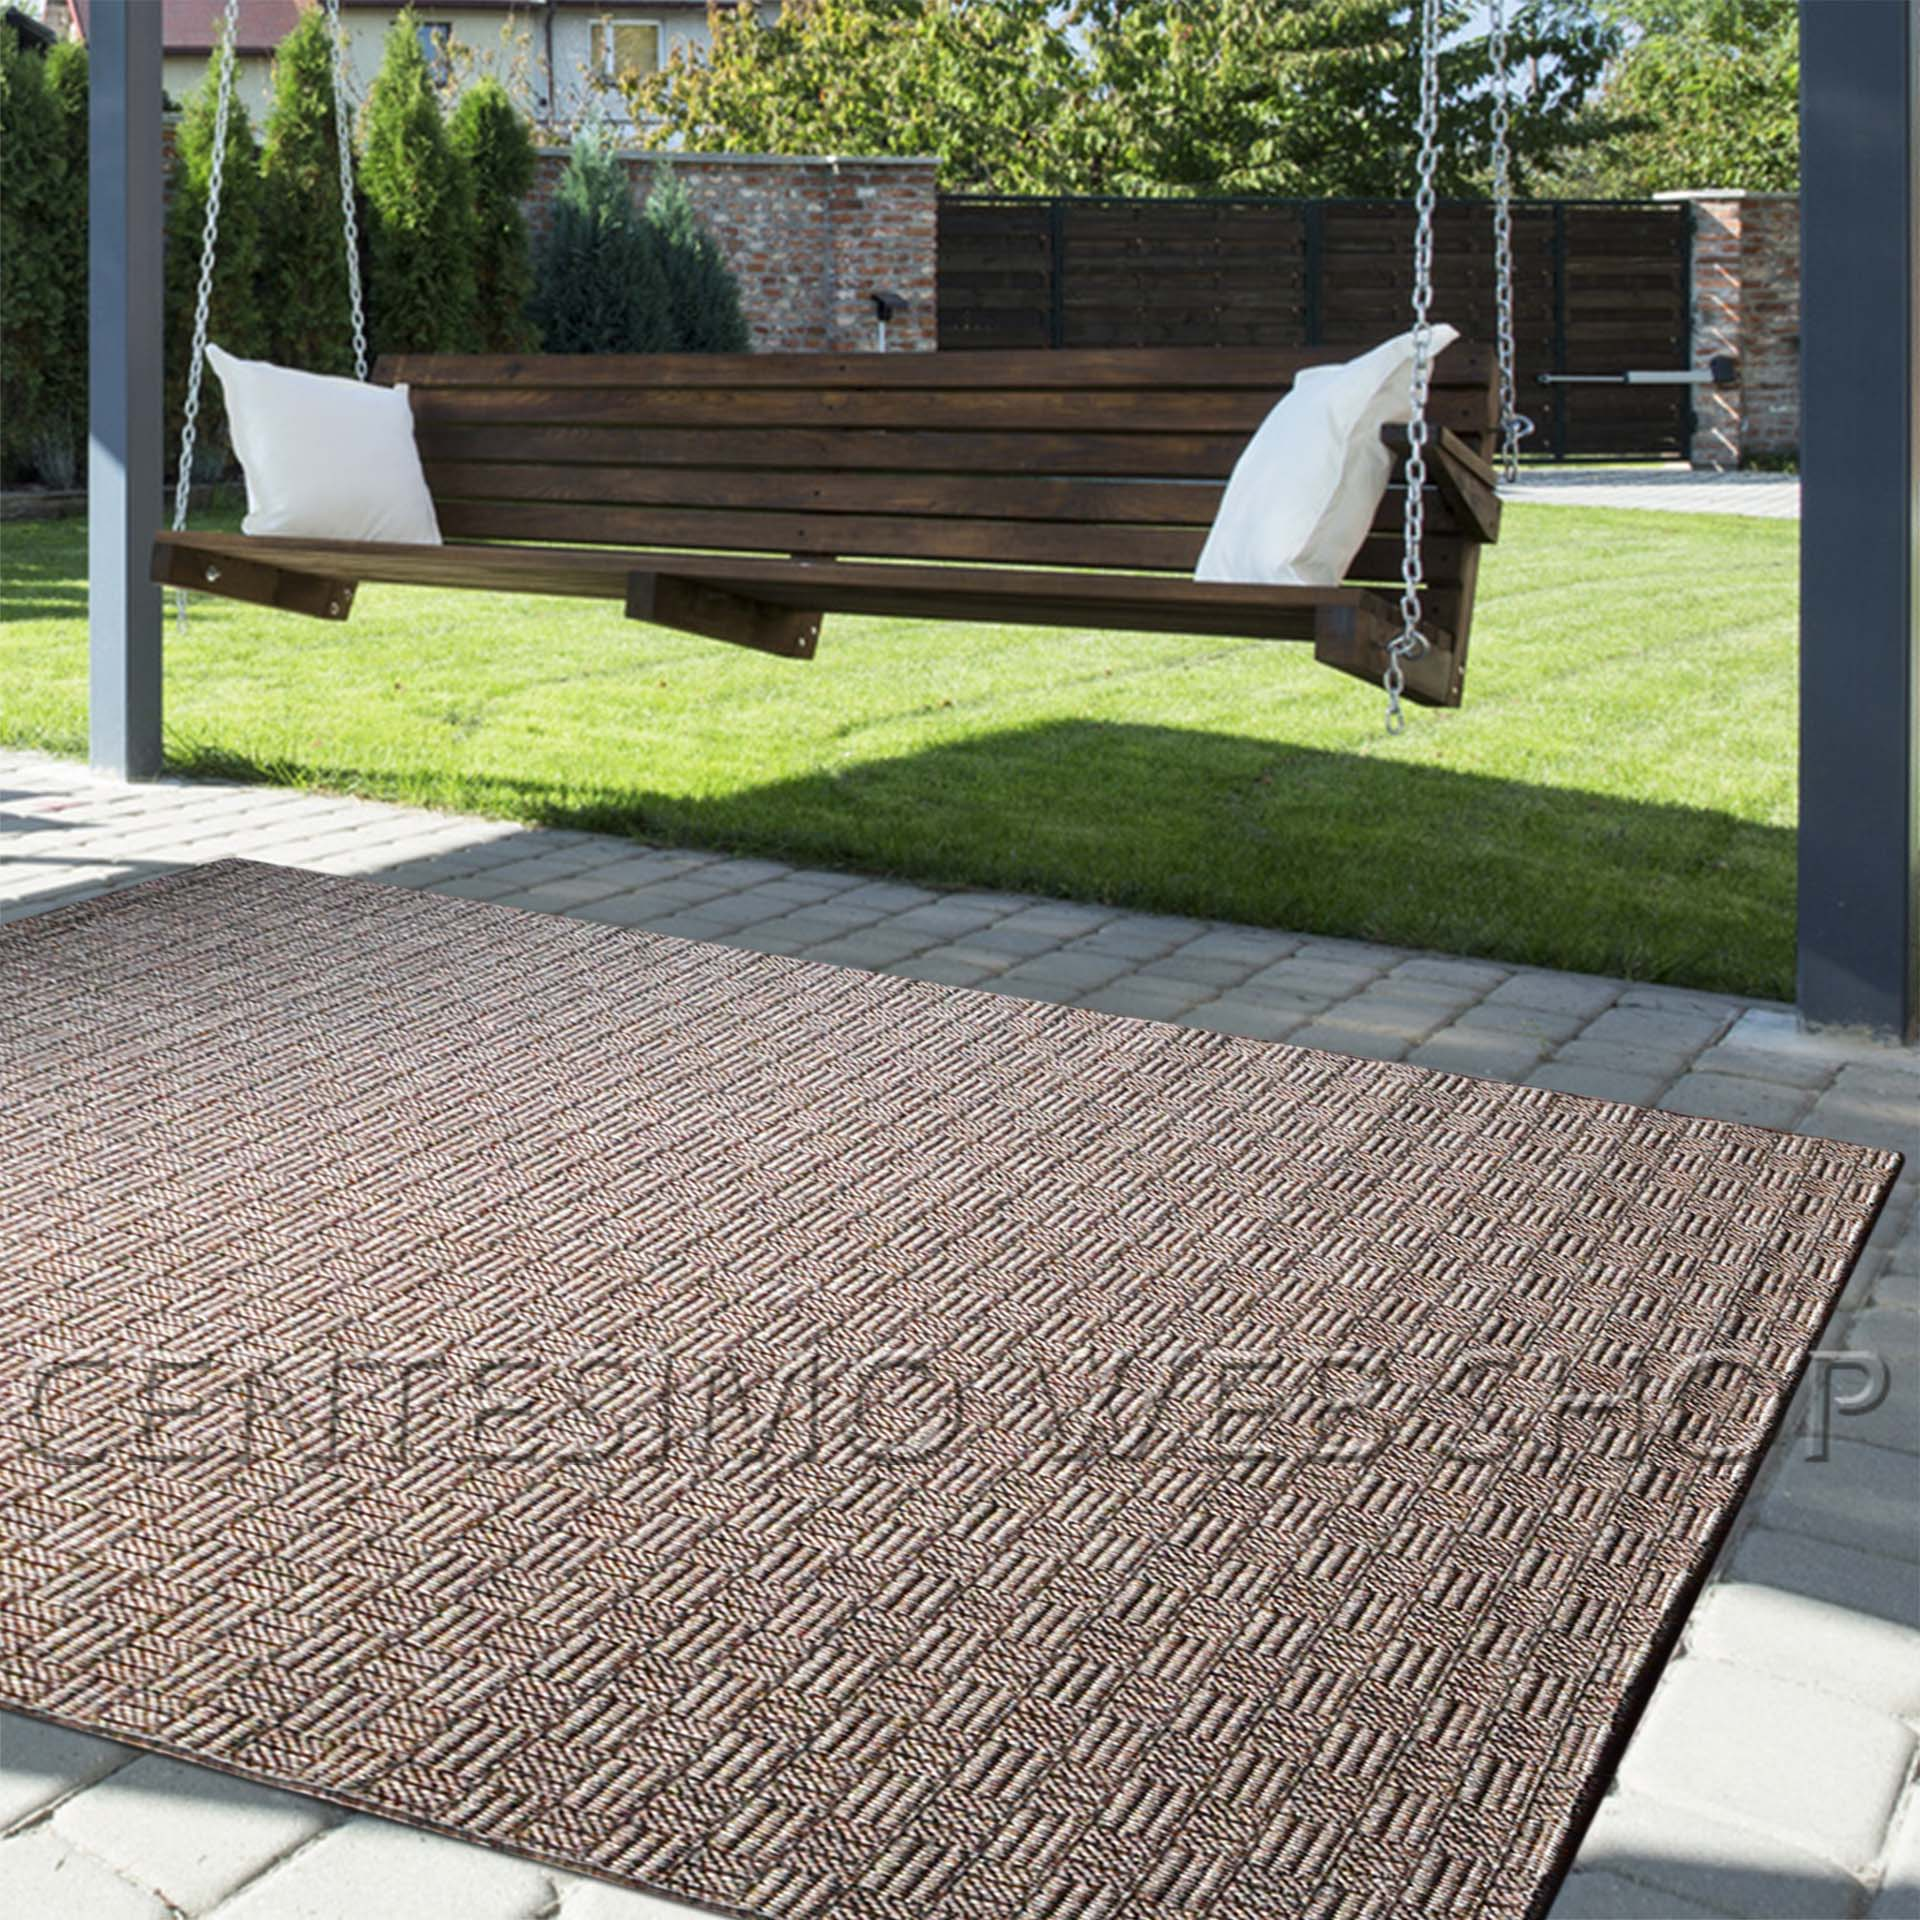 Stuoia esterno 3 misure tappeto piscina giardino 140x200 for Piscinas merino